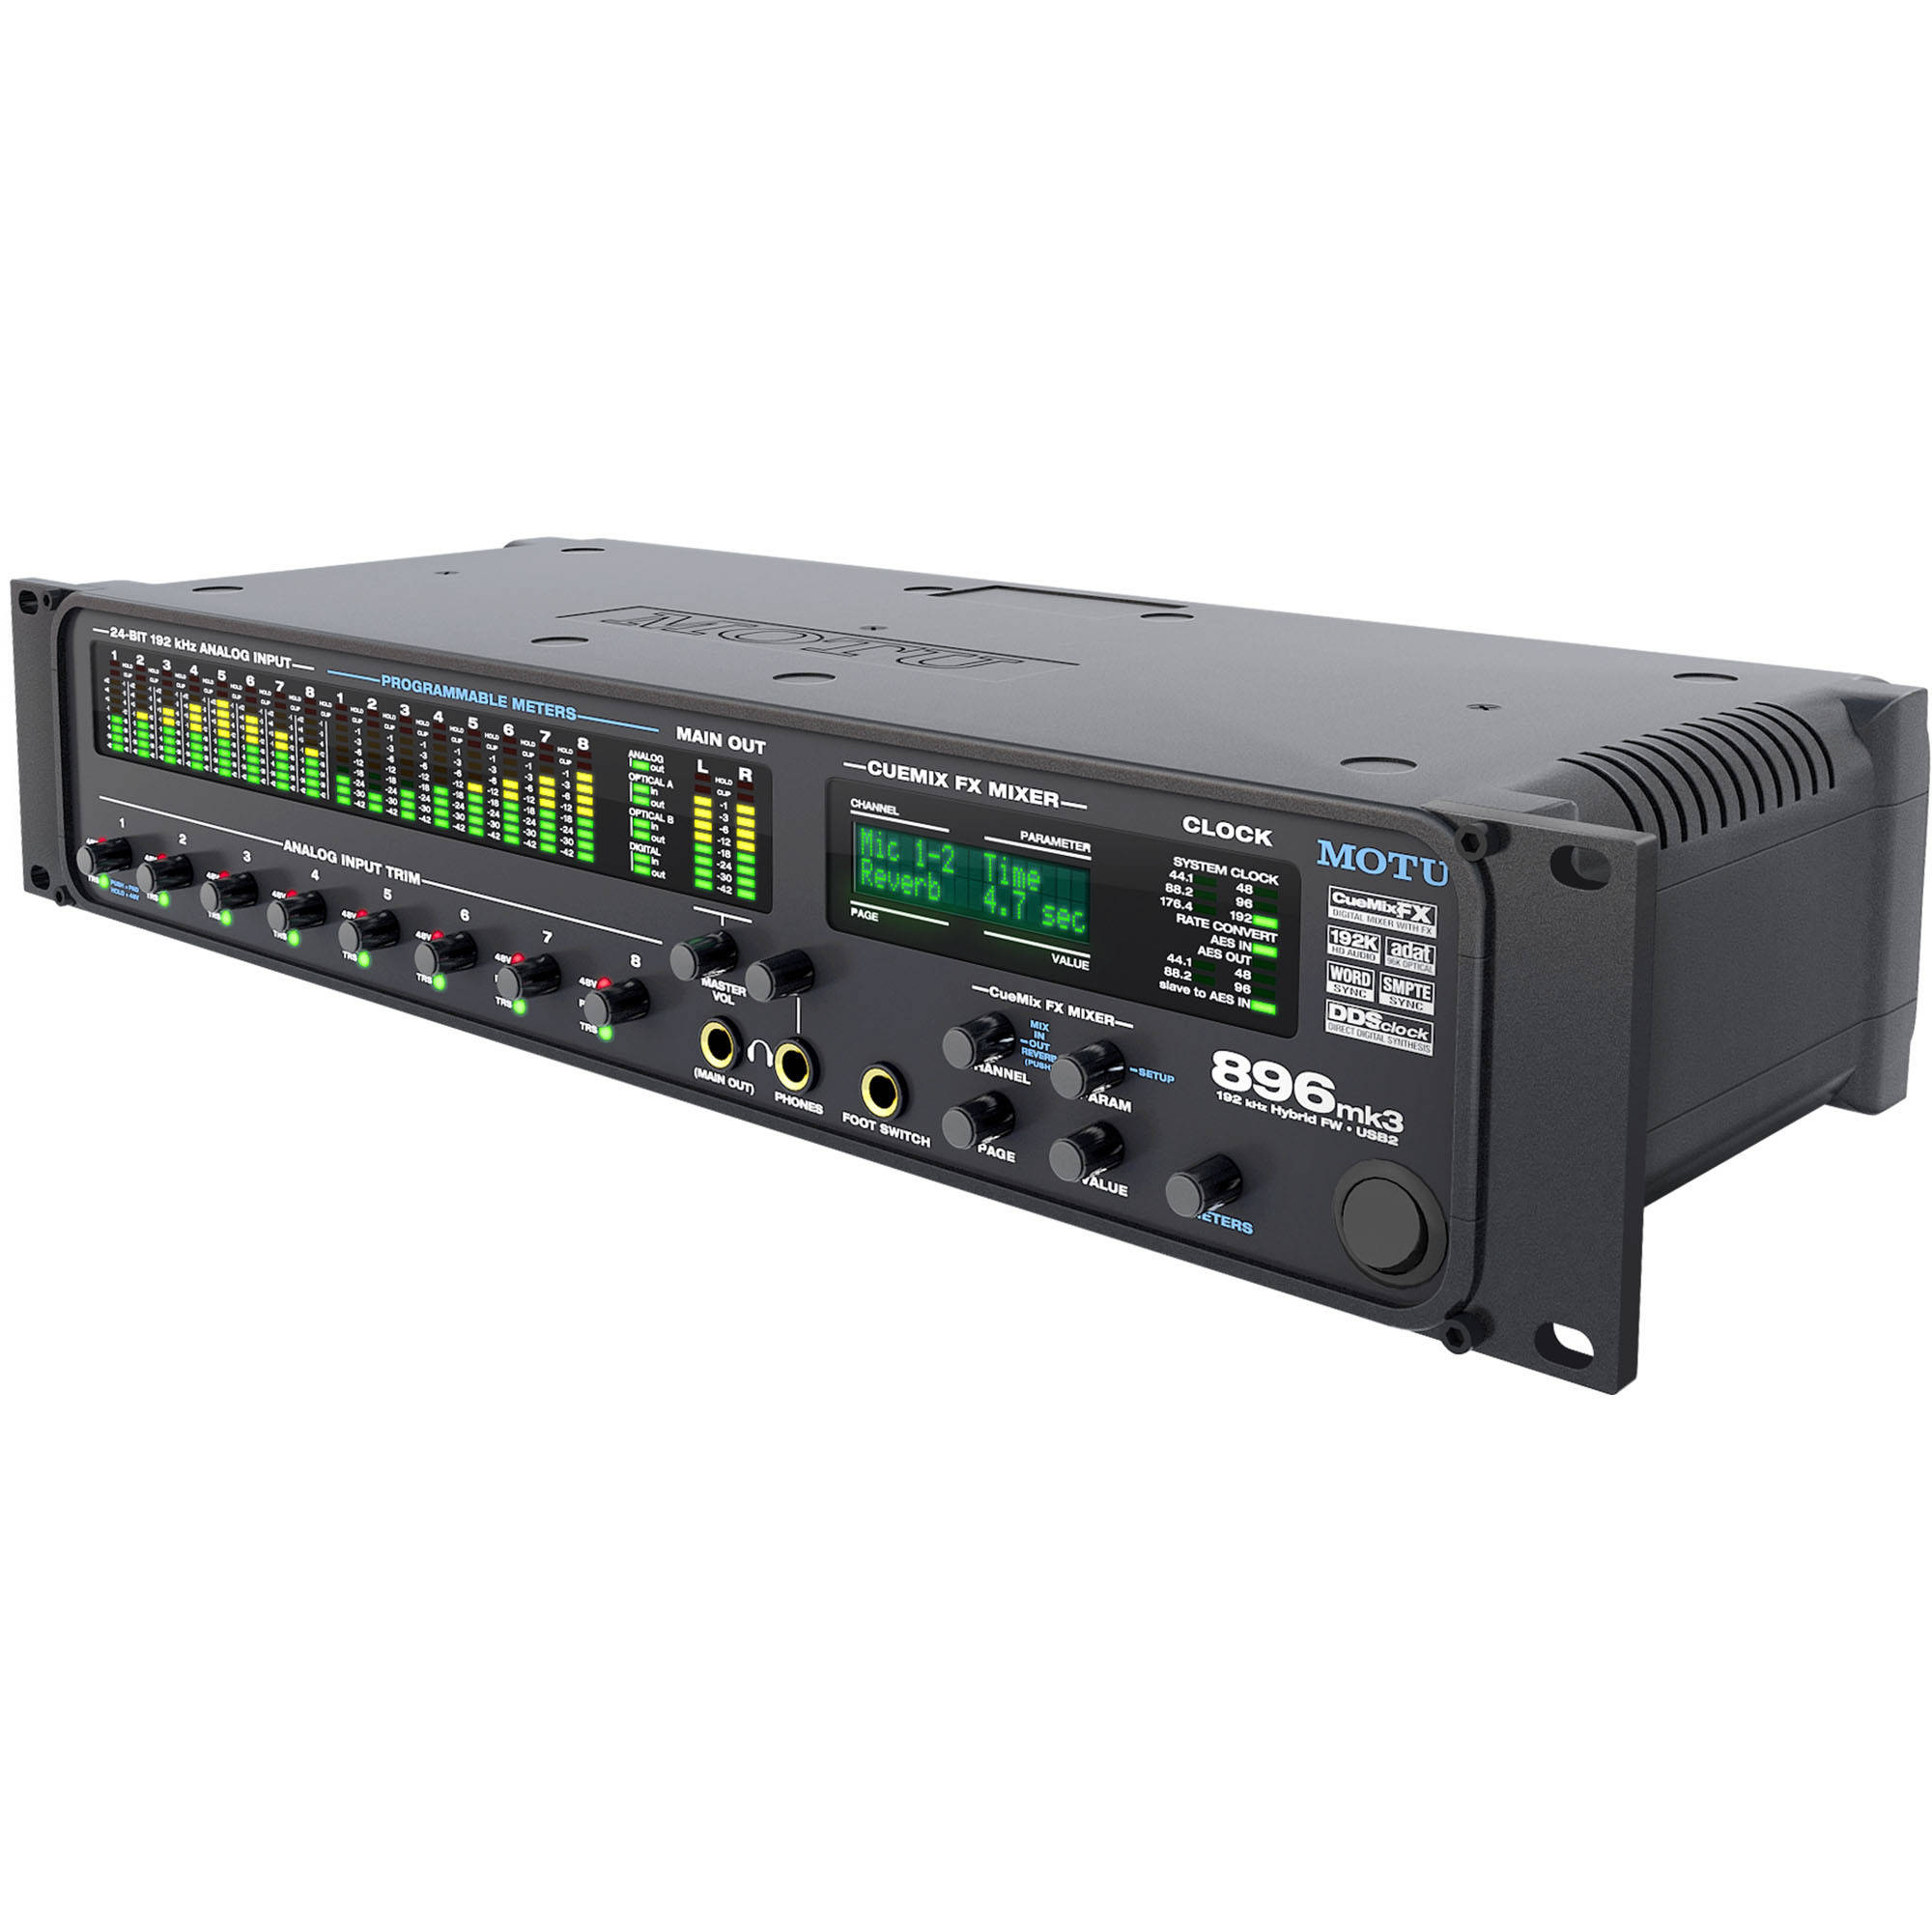 MOTU 896mk3 - FireWire/USB 2.0 Hybrid Audio Interface 4470 B&H